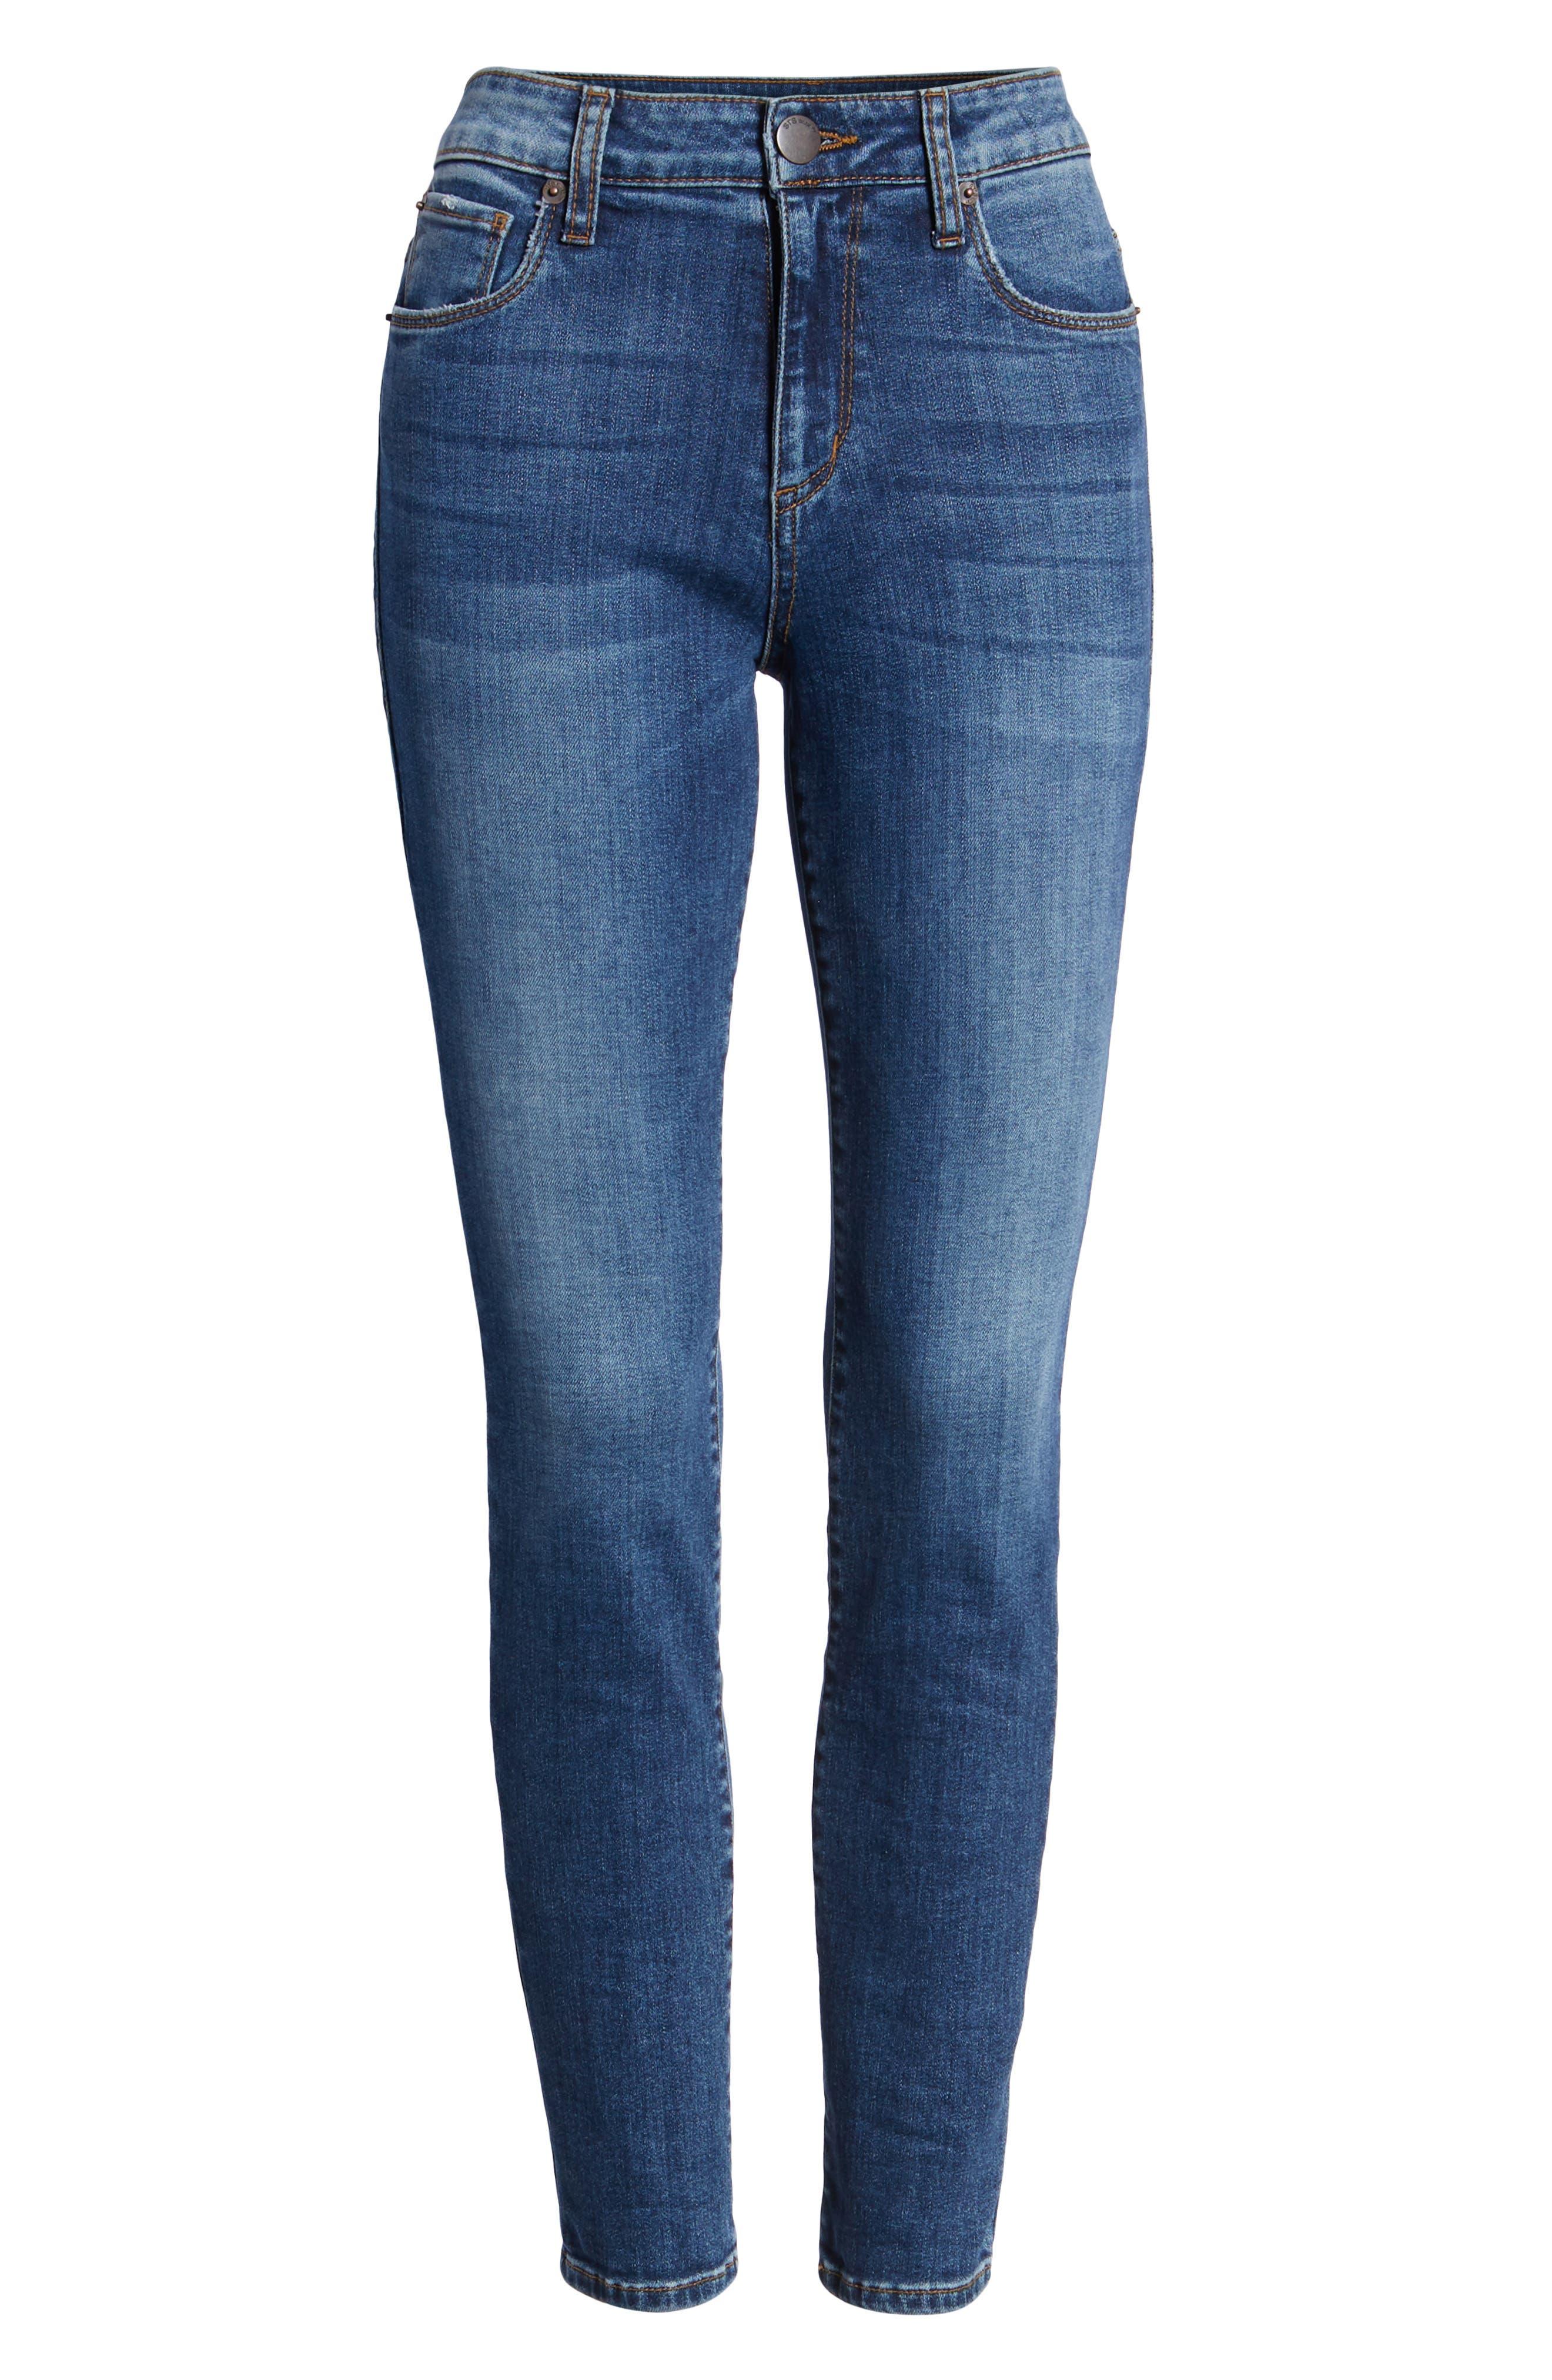 Emma High Waist Ankle Skinny Jeans,                             Alternate thumbnail 7, color,                             MERRYL